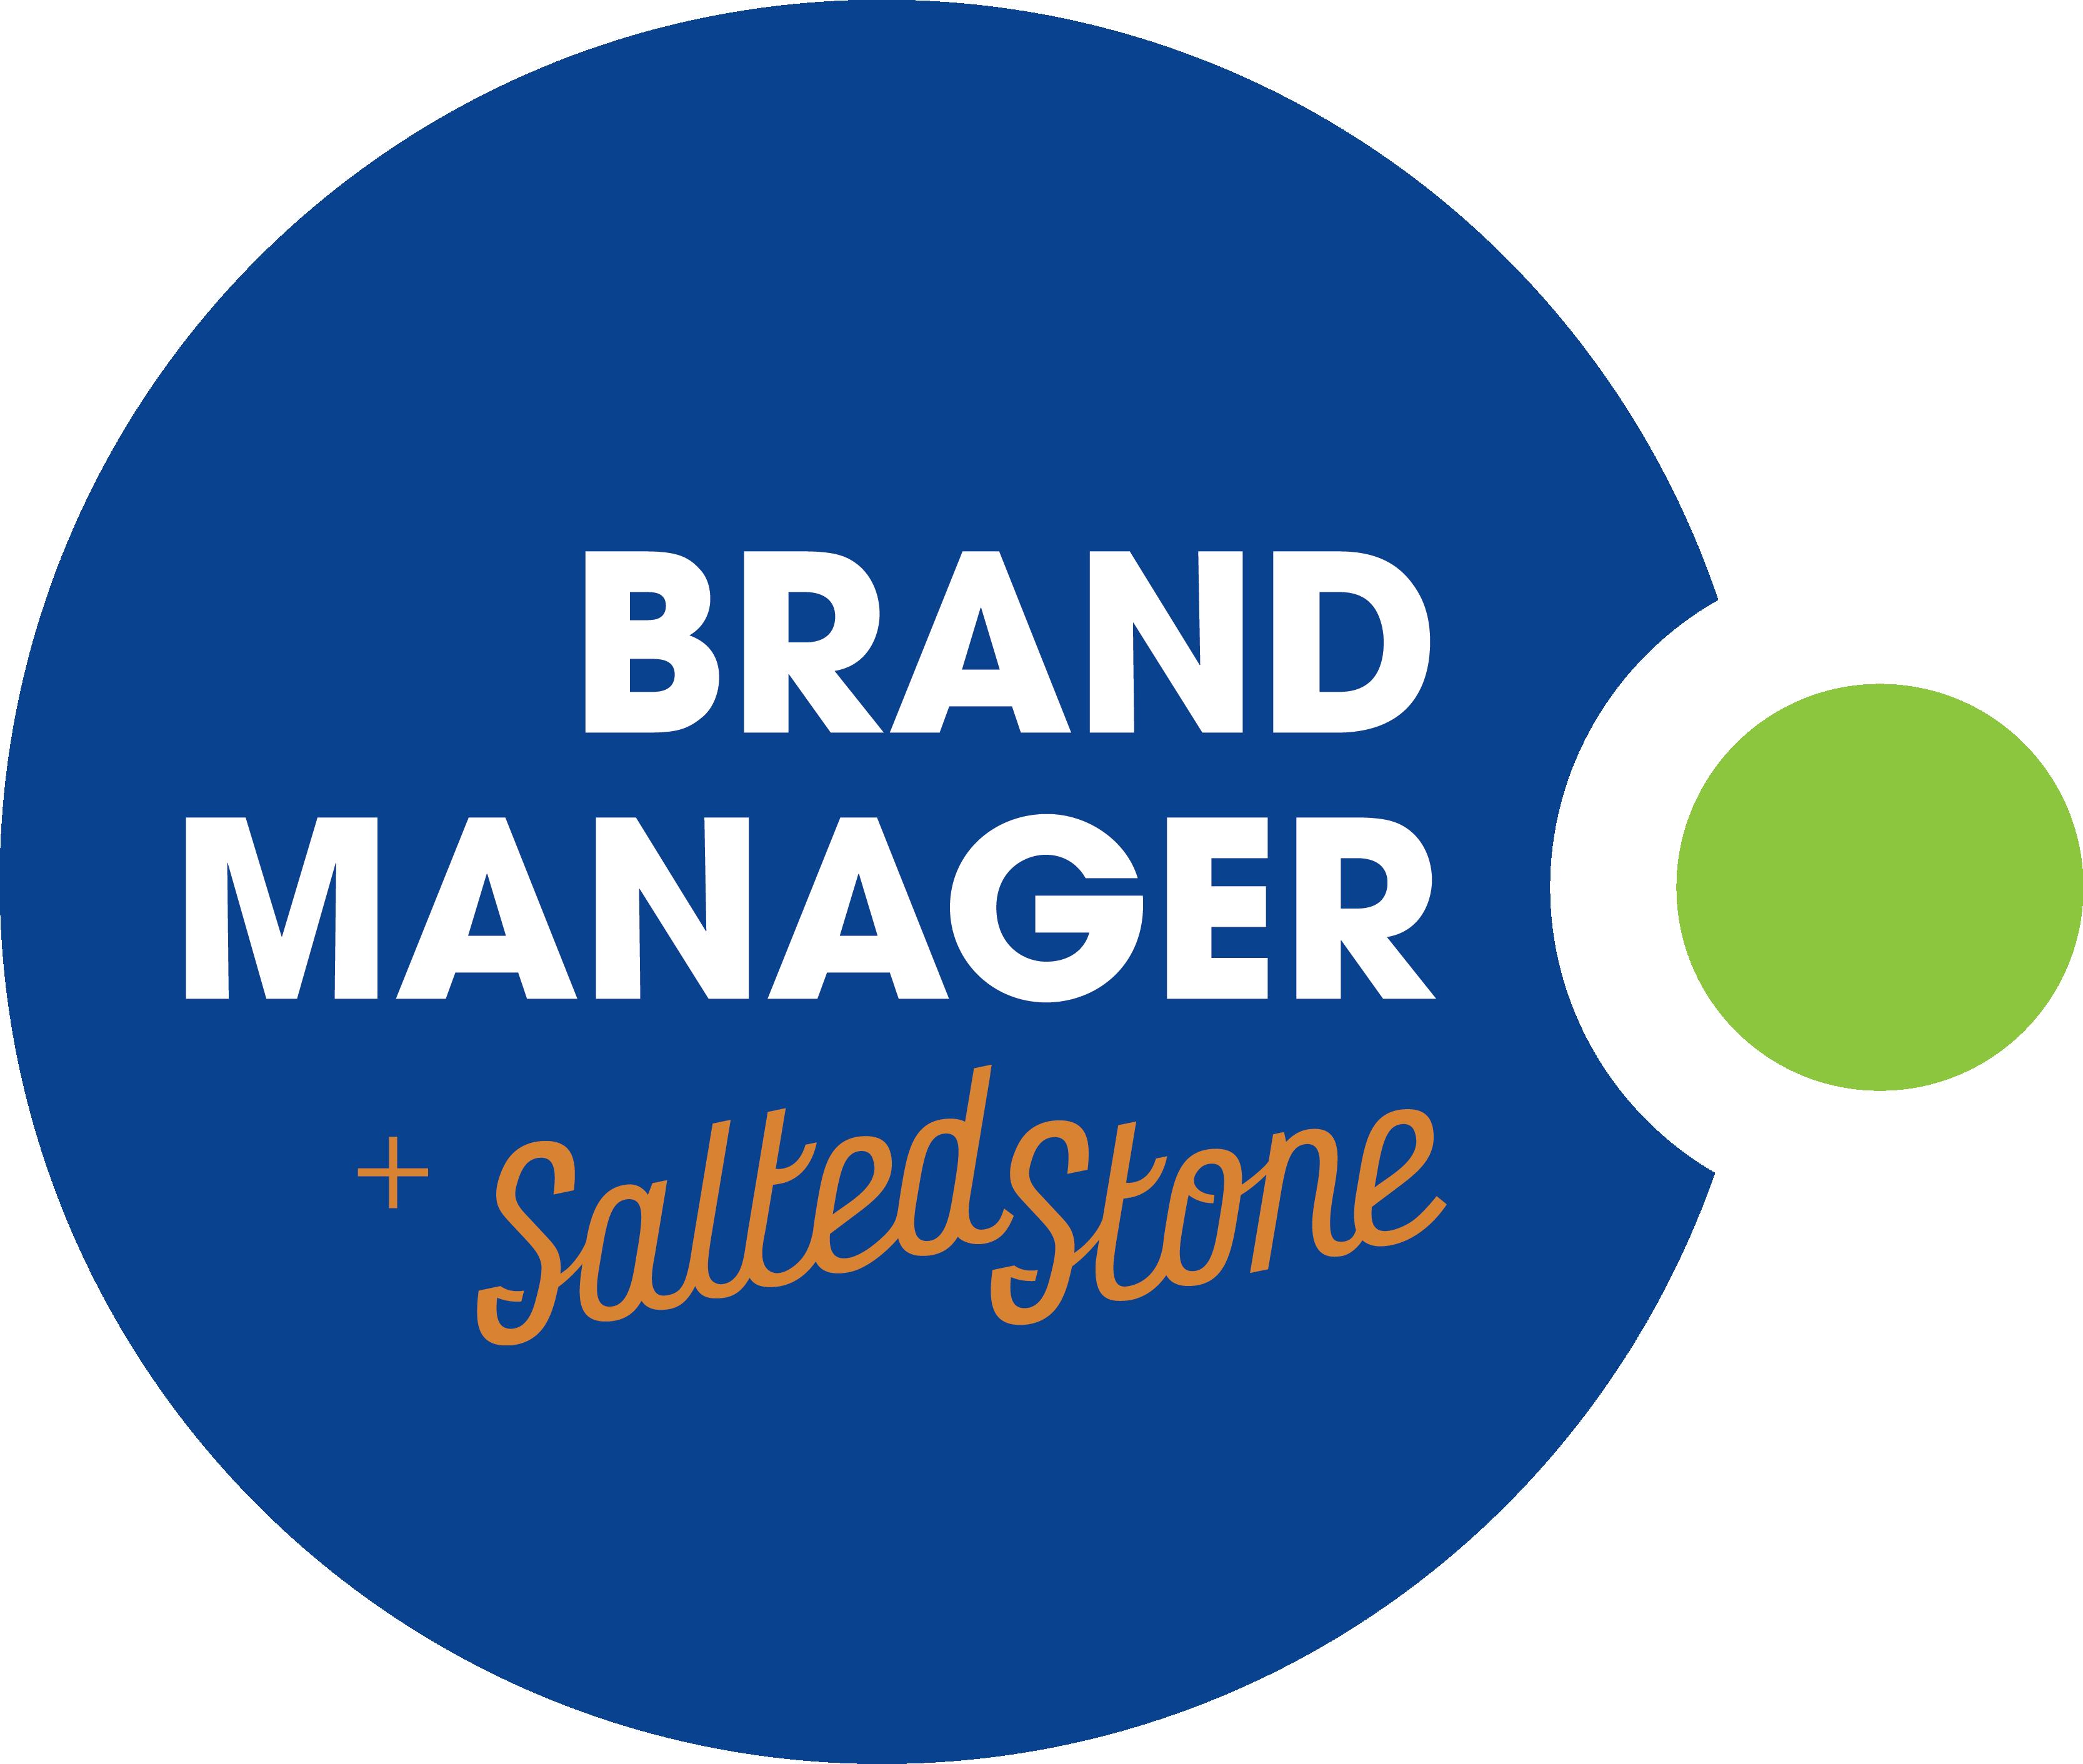 Brandmanager inbound marketing content. Manager clipart brand manager